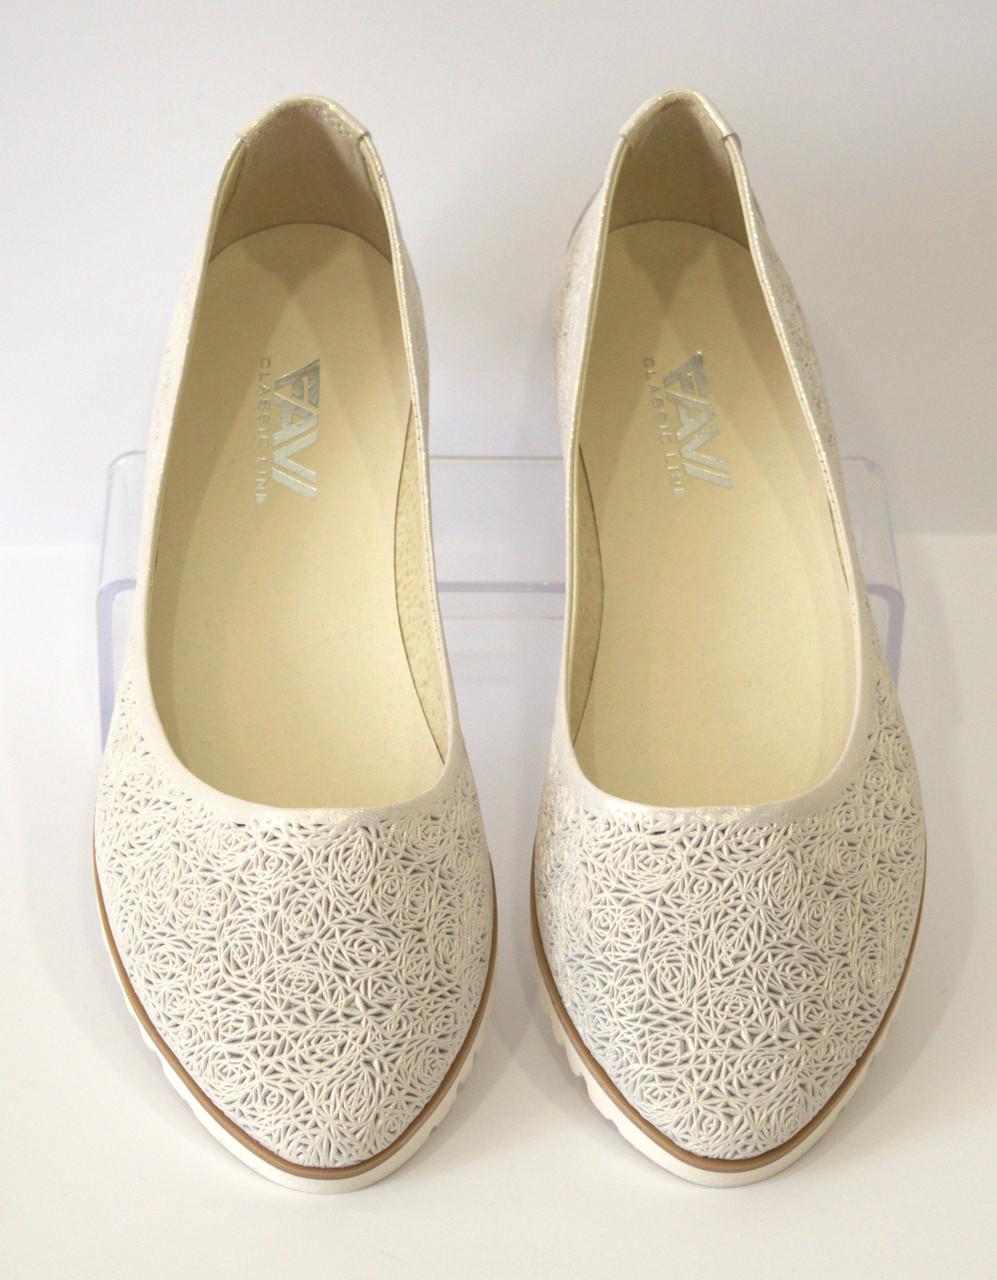 5c288728a Балетки женские летние белые FAVI 240/2 - КРЕЩАТИК - интернет магазин обуви  в Александрии